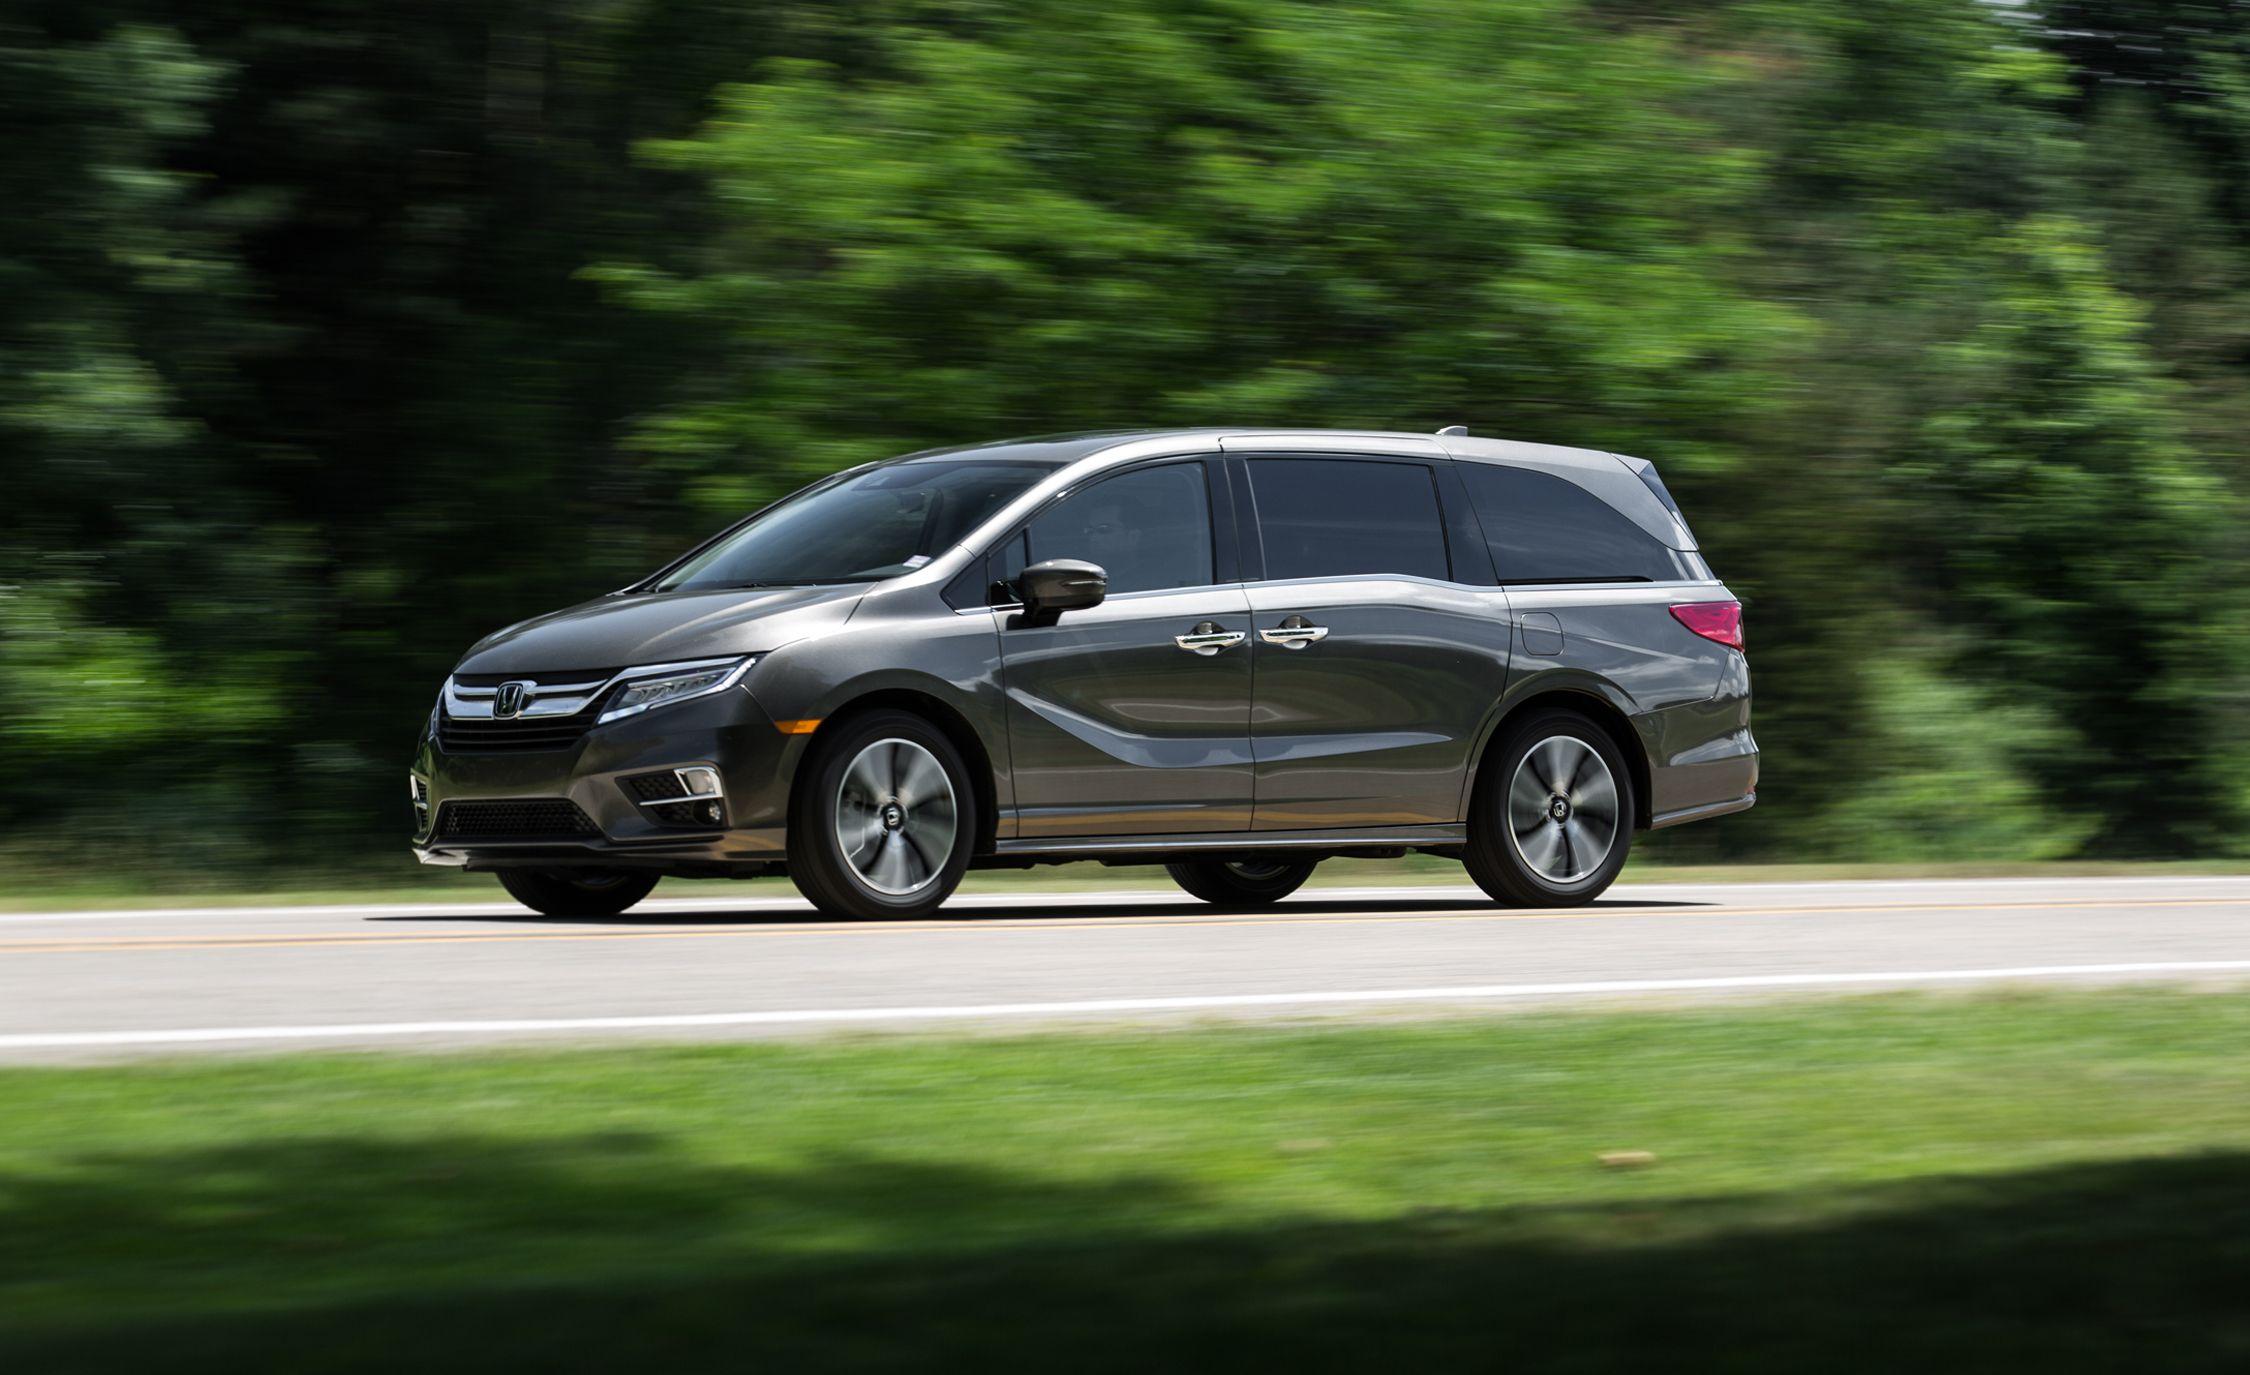 Honda Odyssey Body Diagram Schematics Suspension Reviews Price Photos And Specs Car